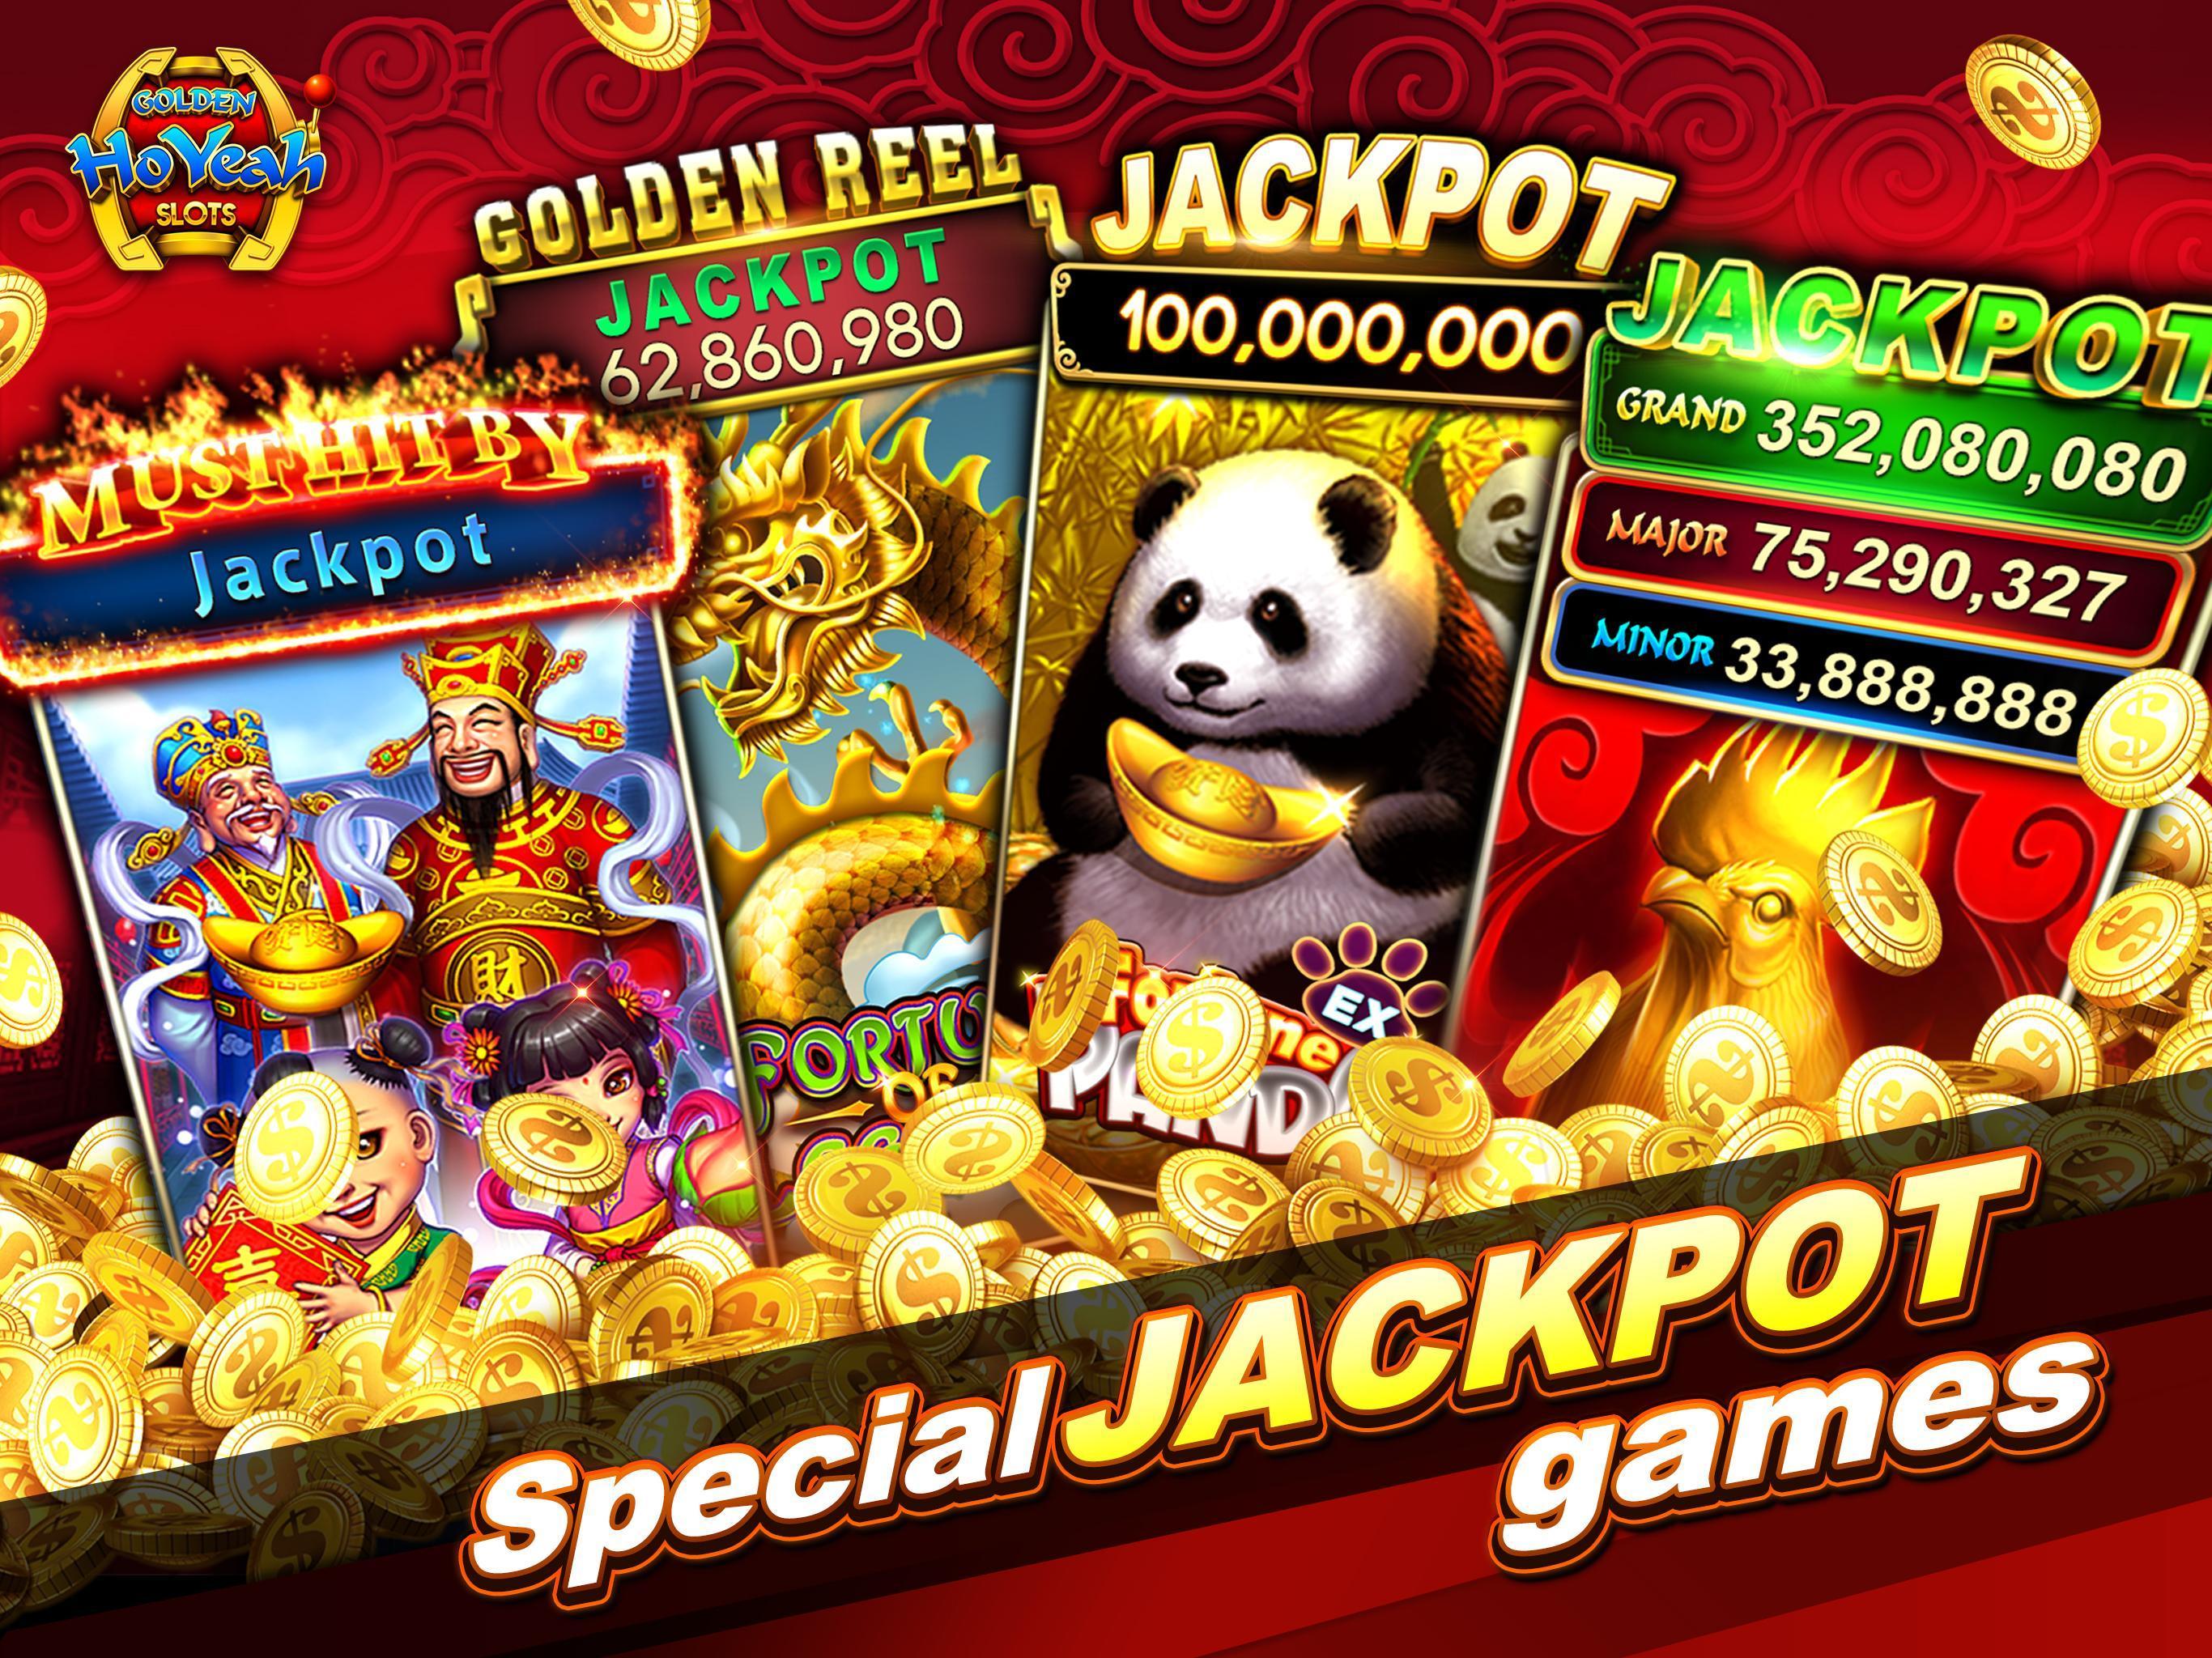 Slots (Golden HoYeah) - Casino Slots 2.5.7 Screenshot 6